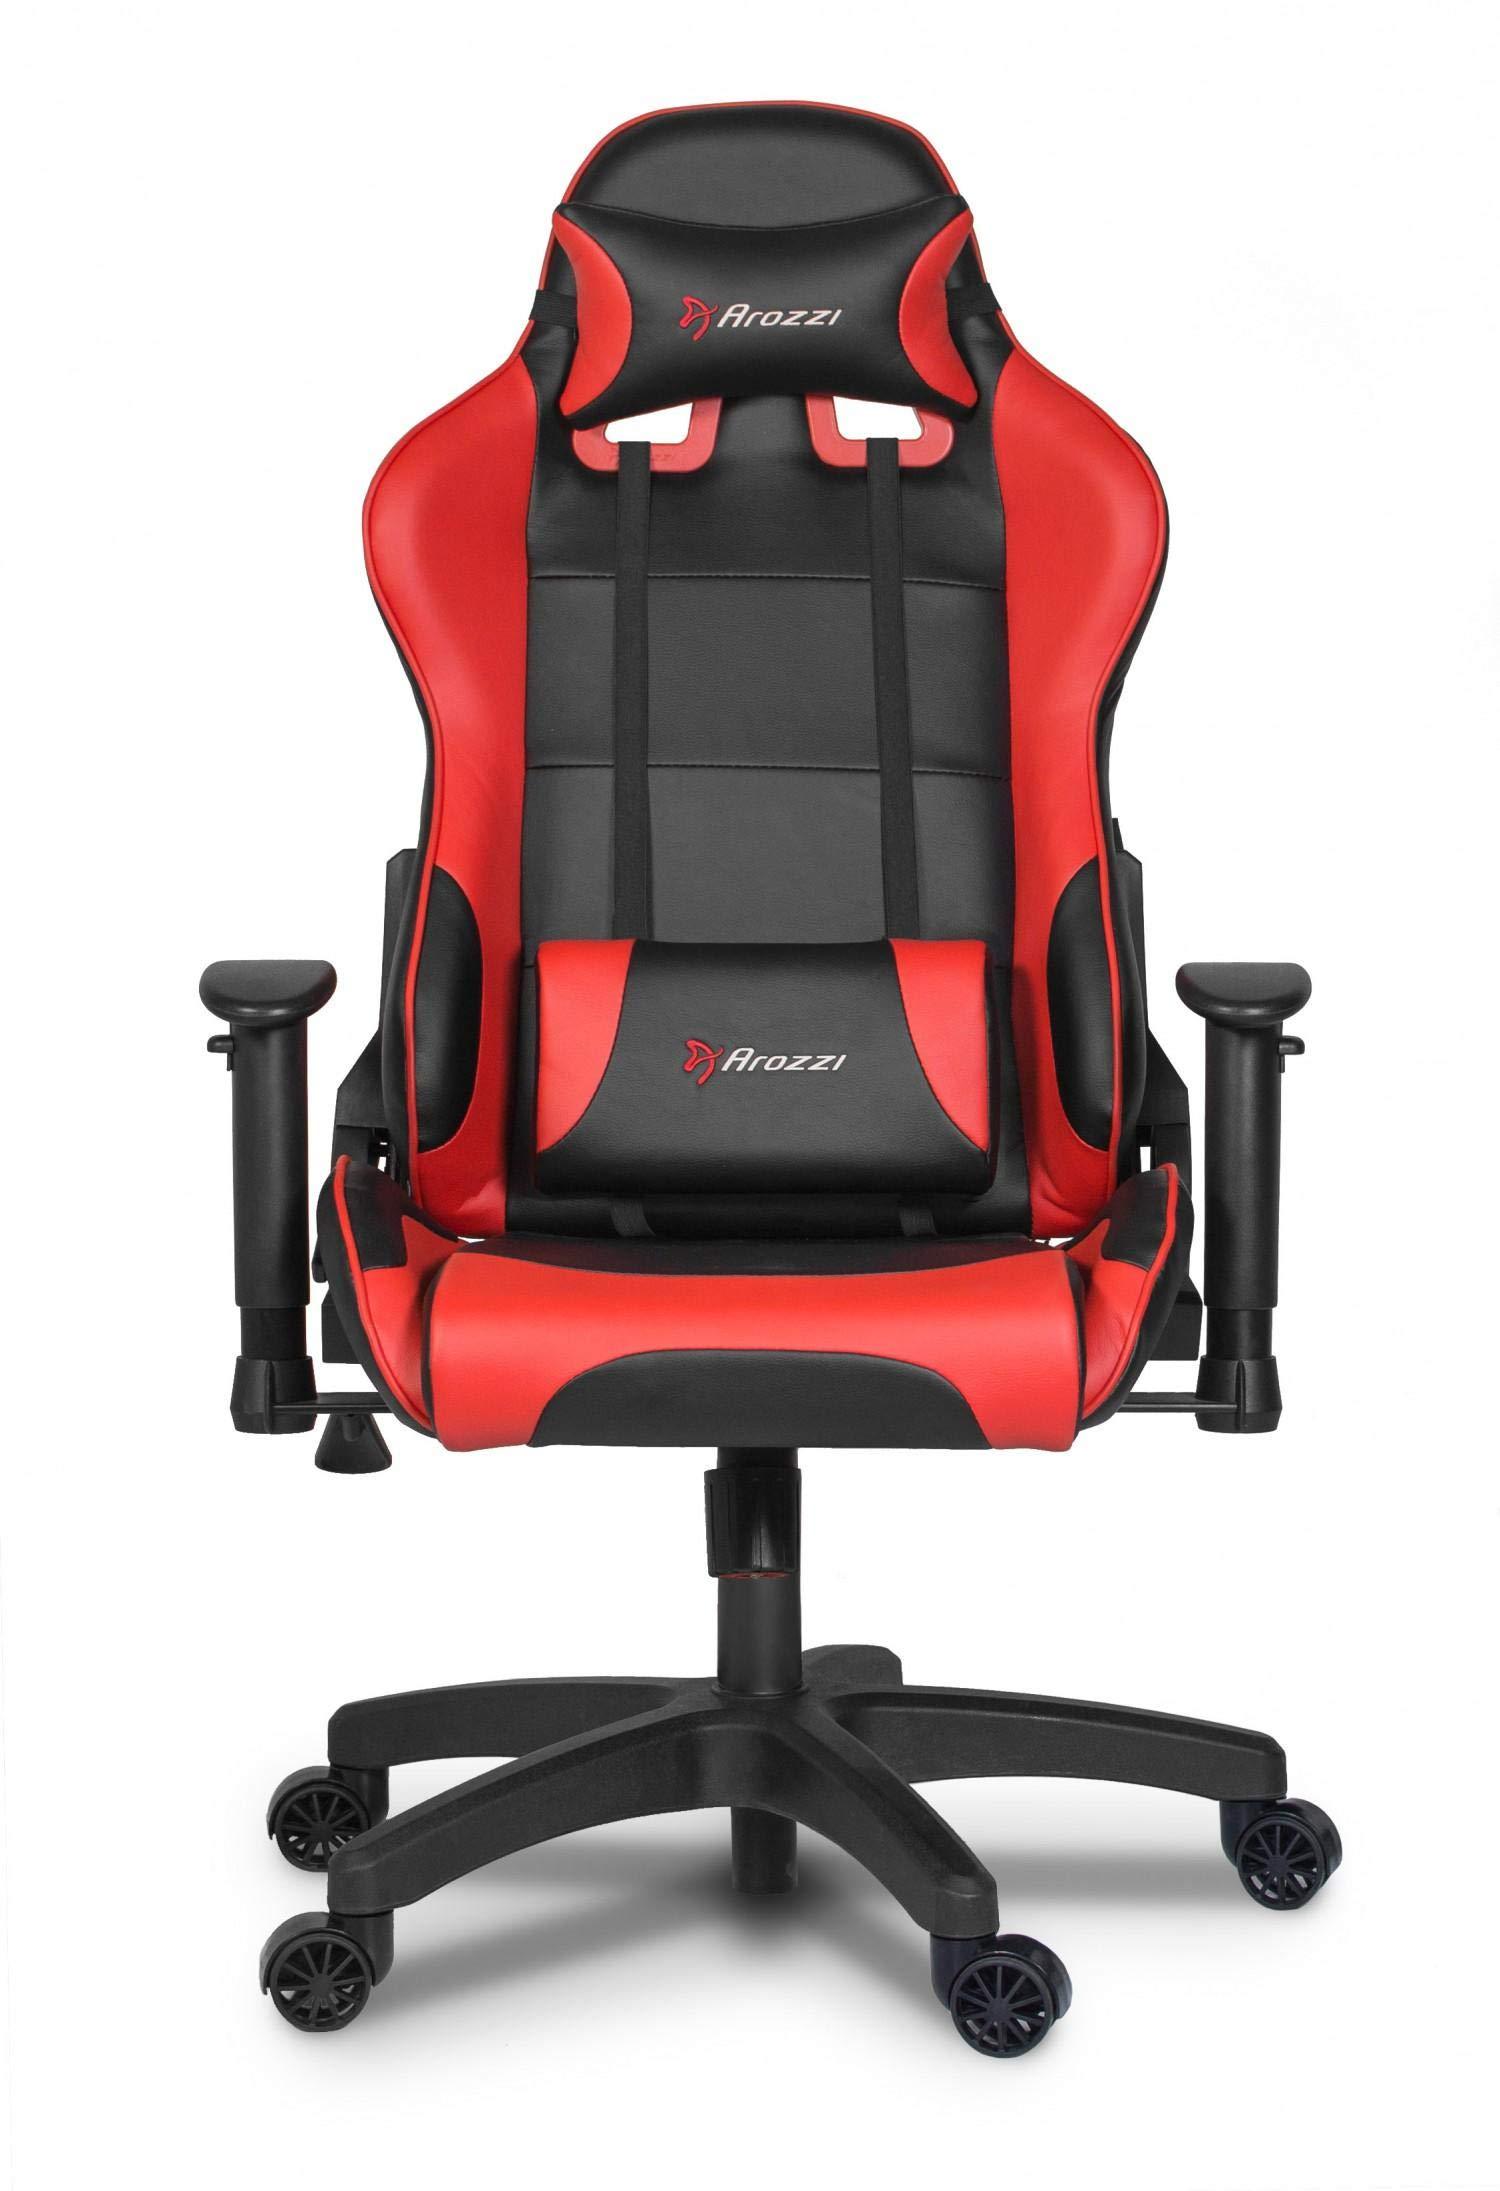 Amazing Arozzi Verona Junior Gaming Chair For Kids Red Price In Uae Machost Co Dining Chair Design Ideas Machostcouk